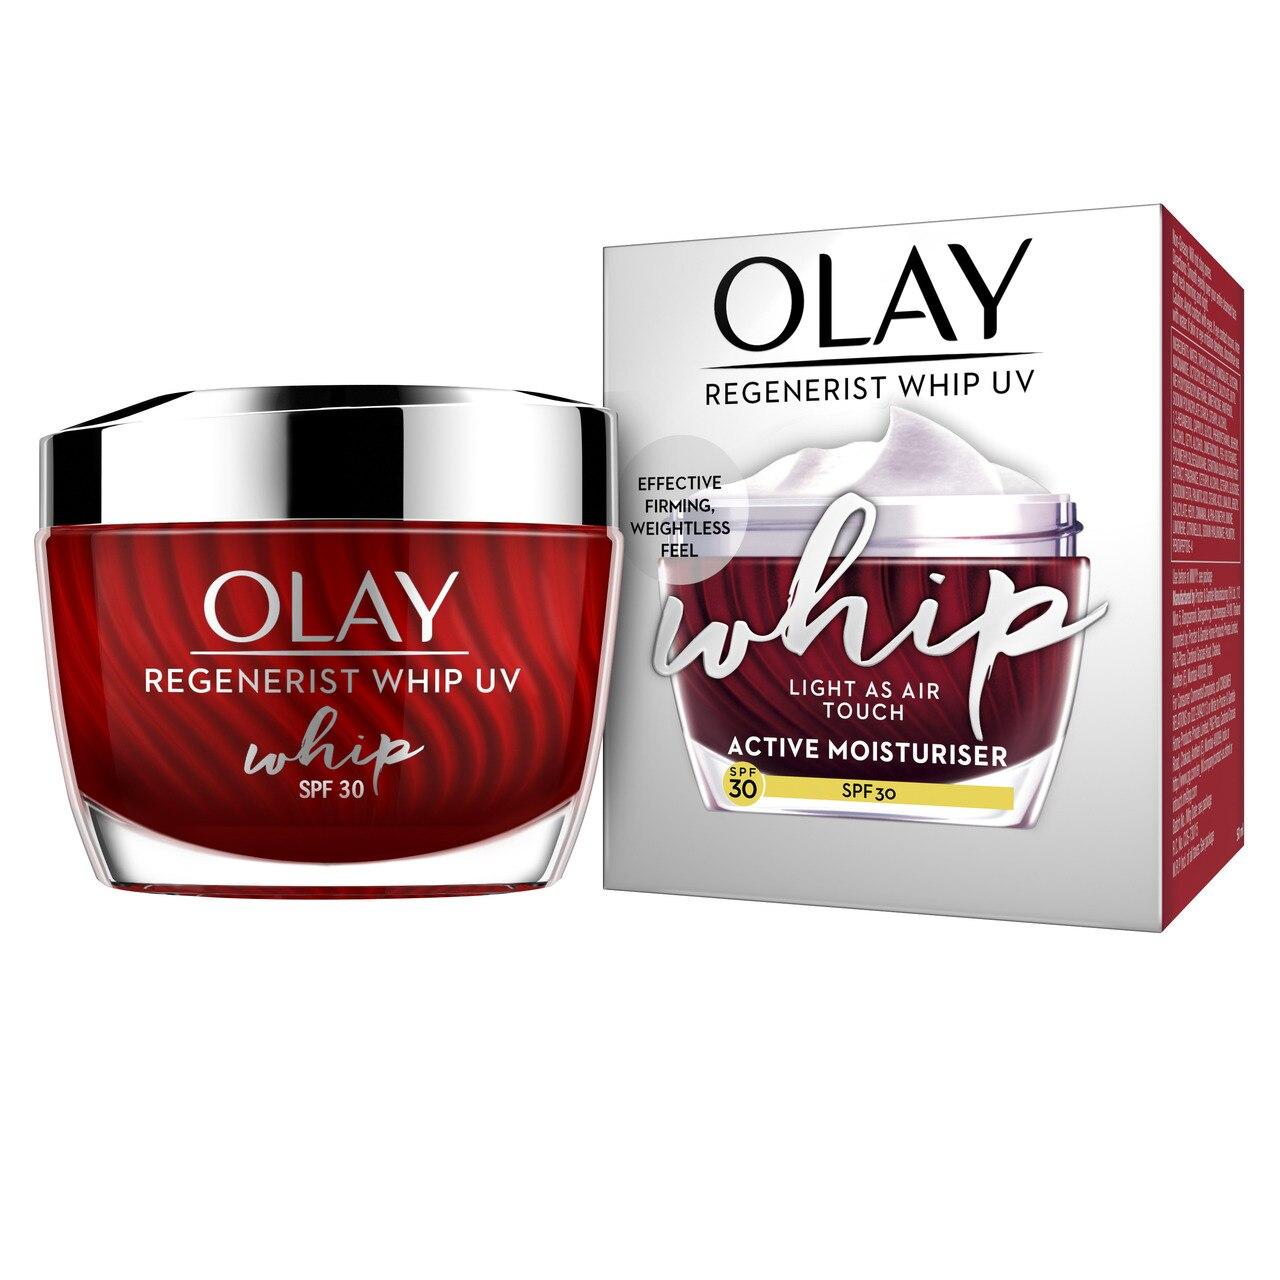 Olay Regenerist Whip SPF 30